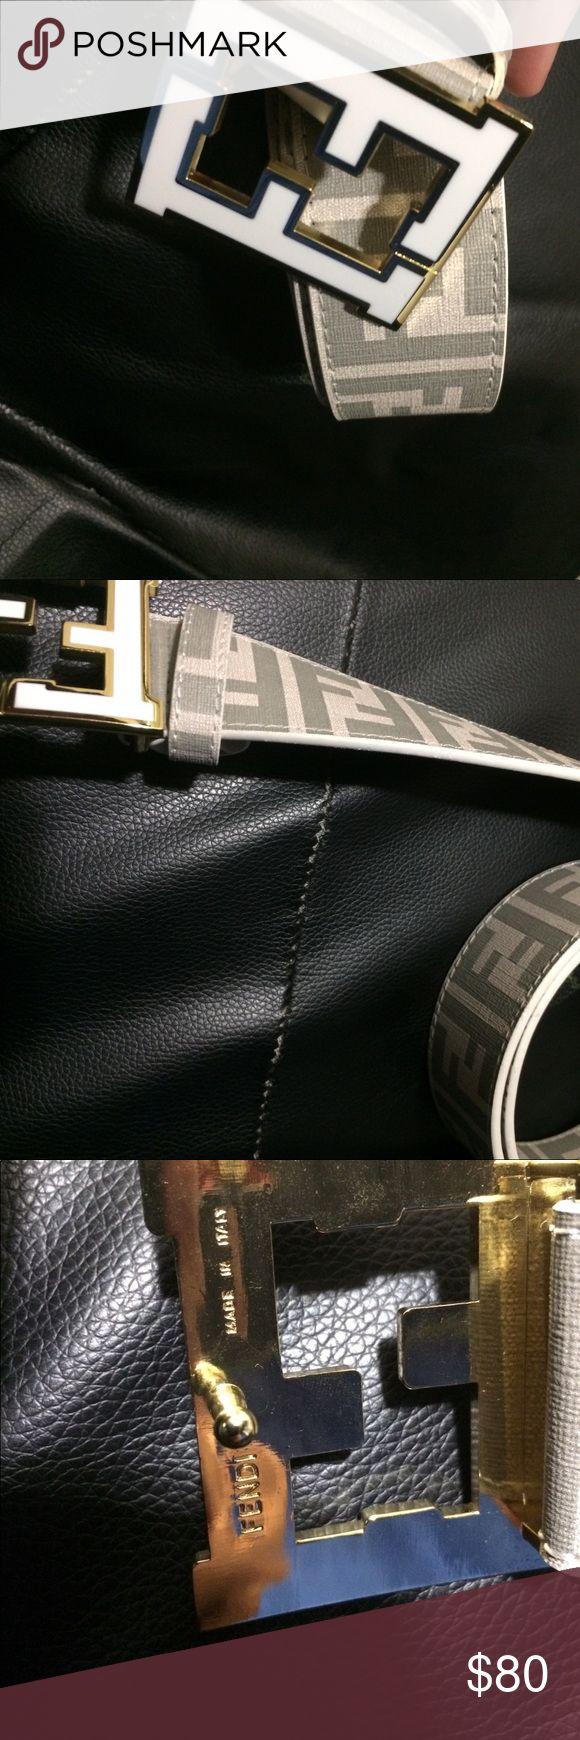 Men's Fendi belt White mens fendi belt. Brand new UA fendi belt. Fits size 30-36 Fendi Accessories Belts